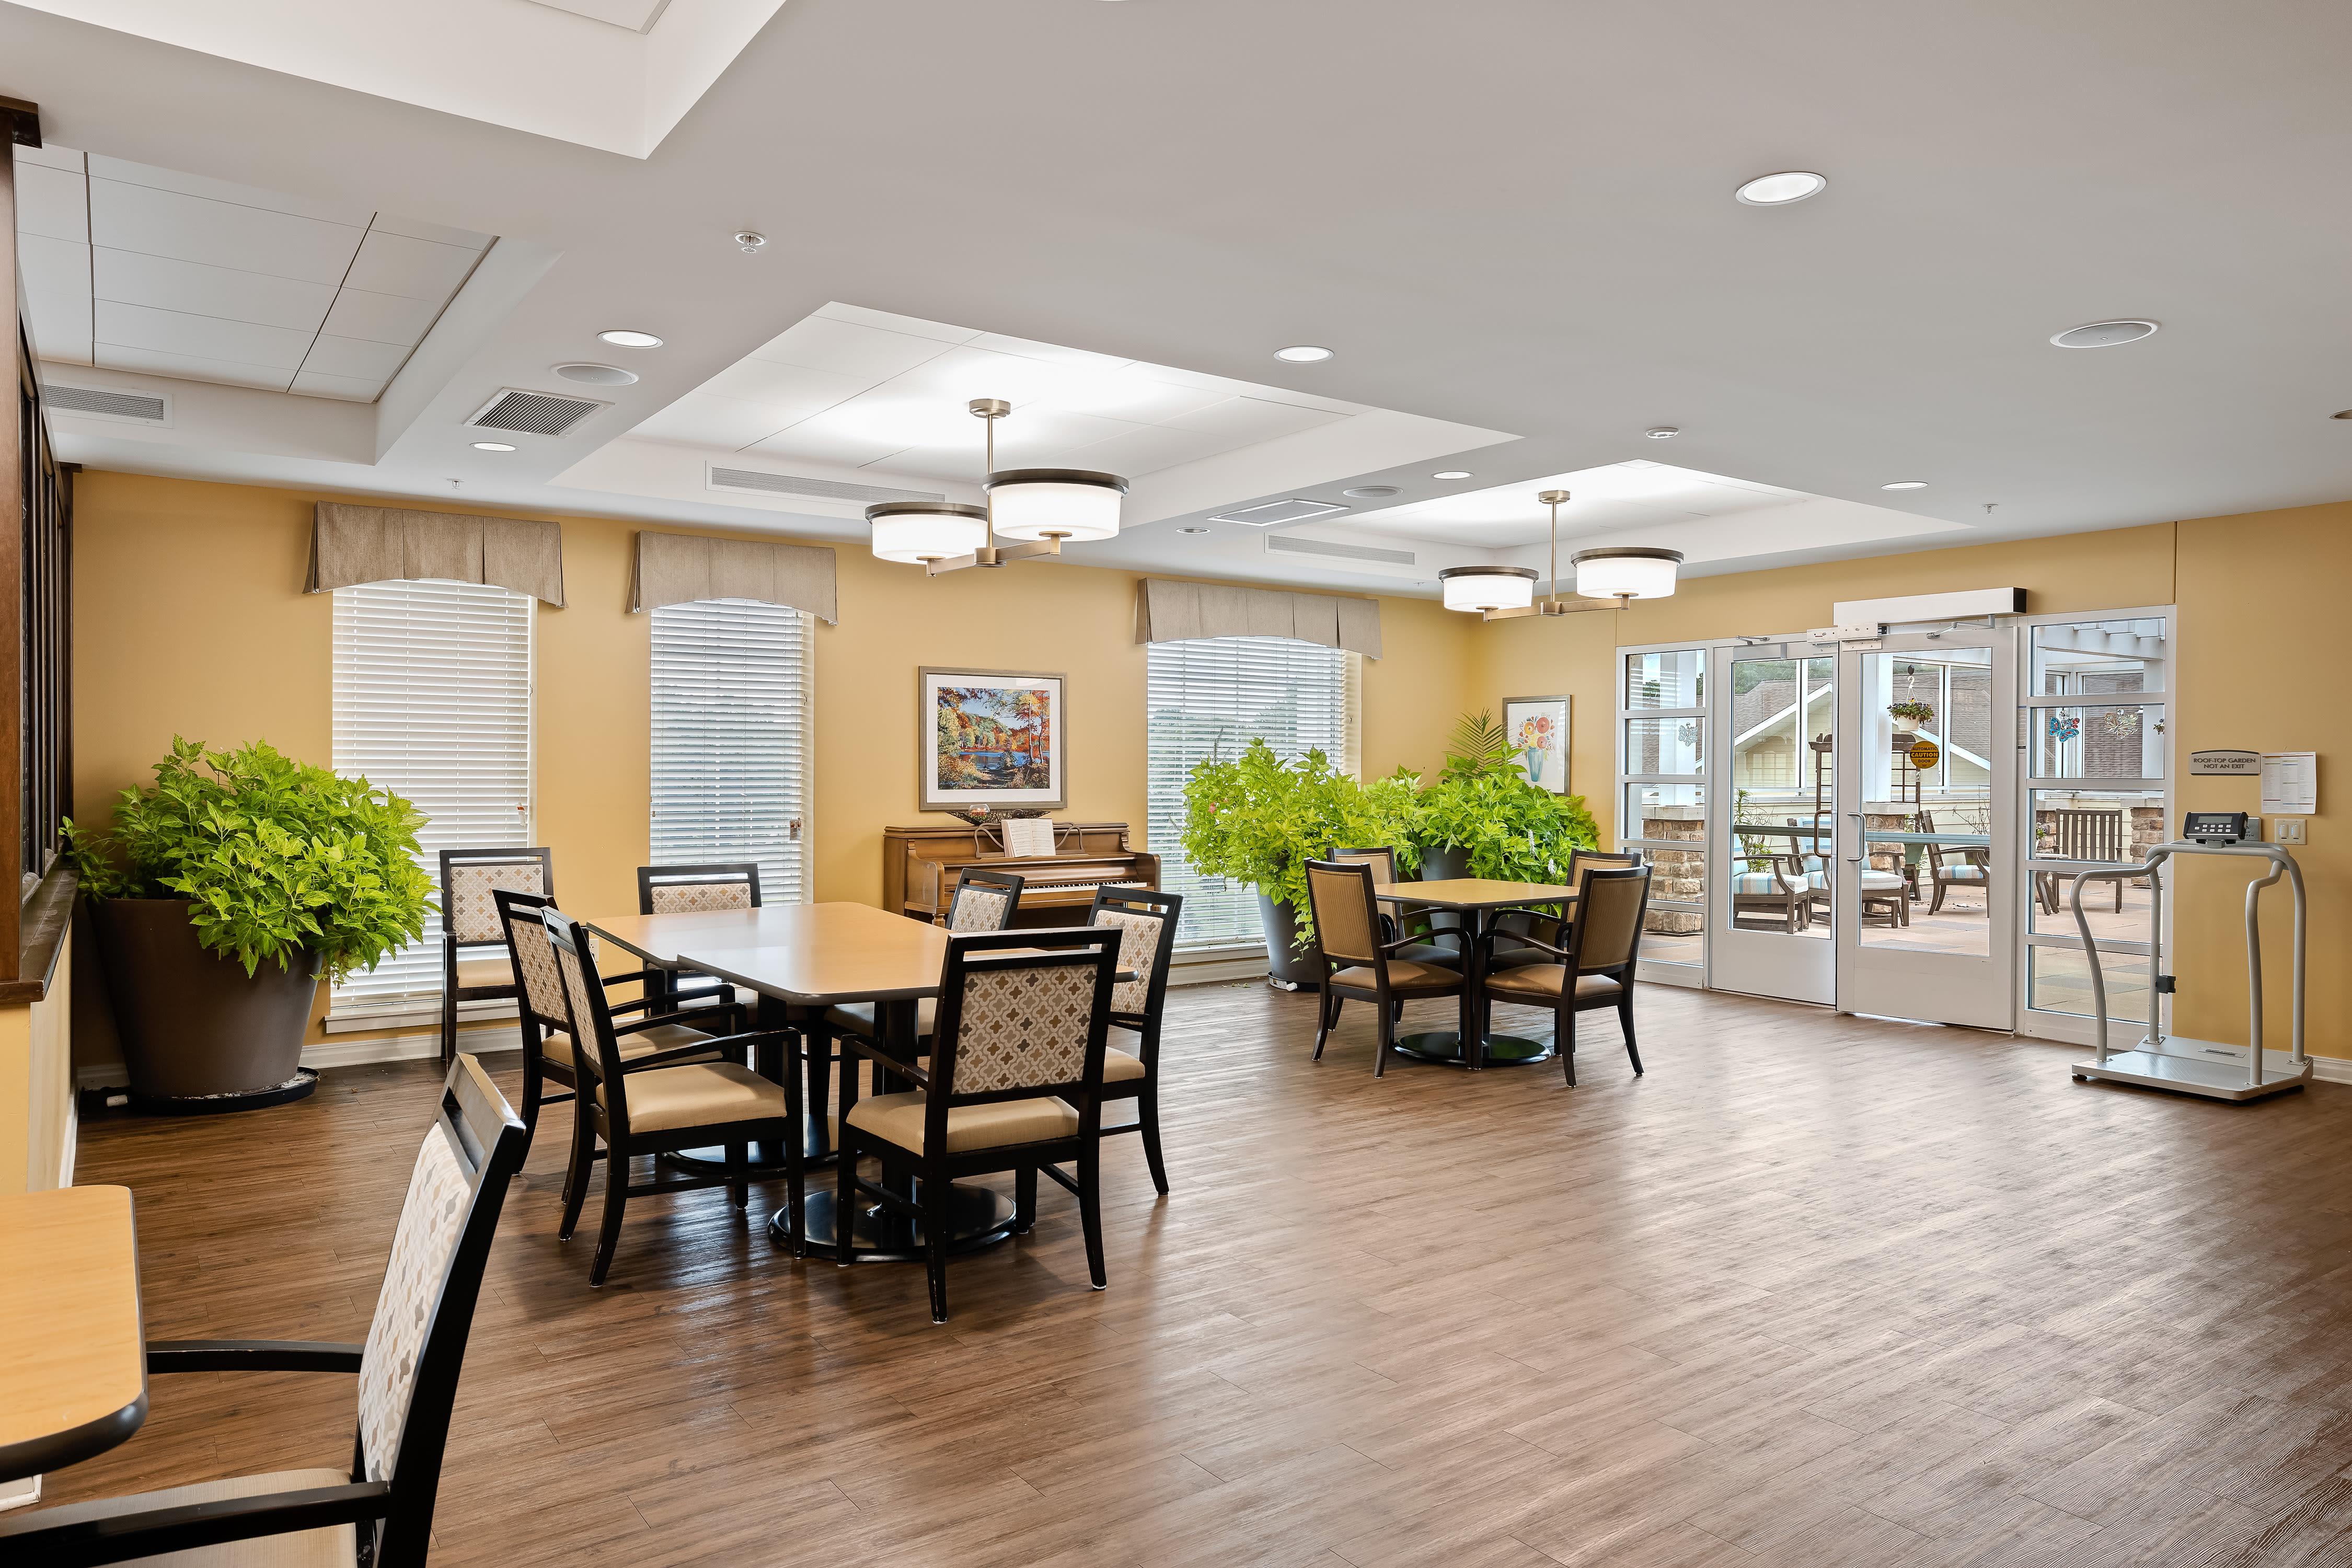 A dining room at Anthology of Overland Park in Overland Park, Kansas